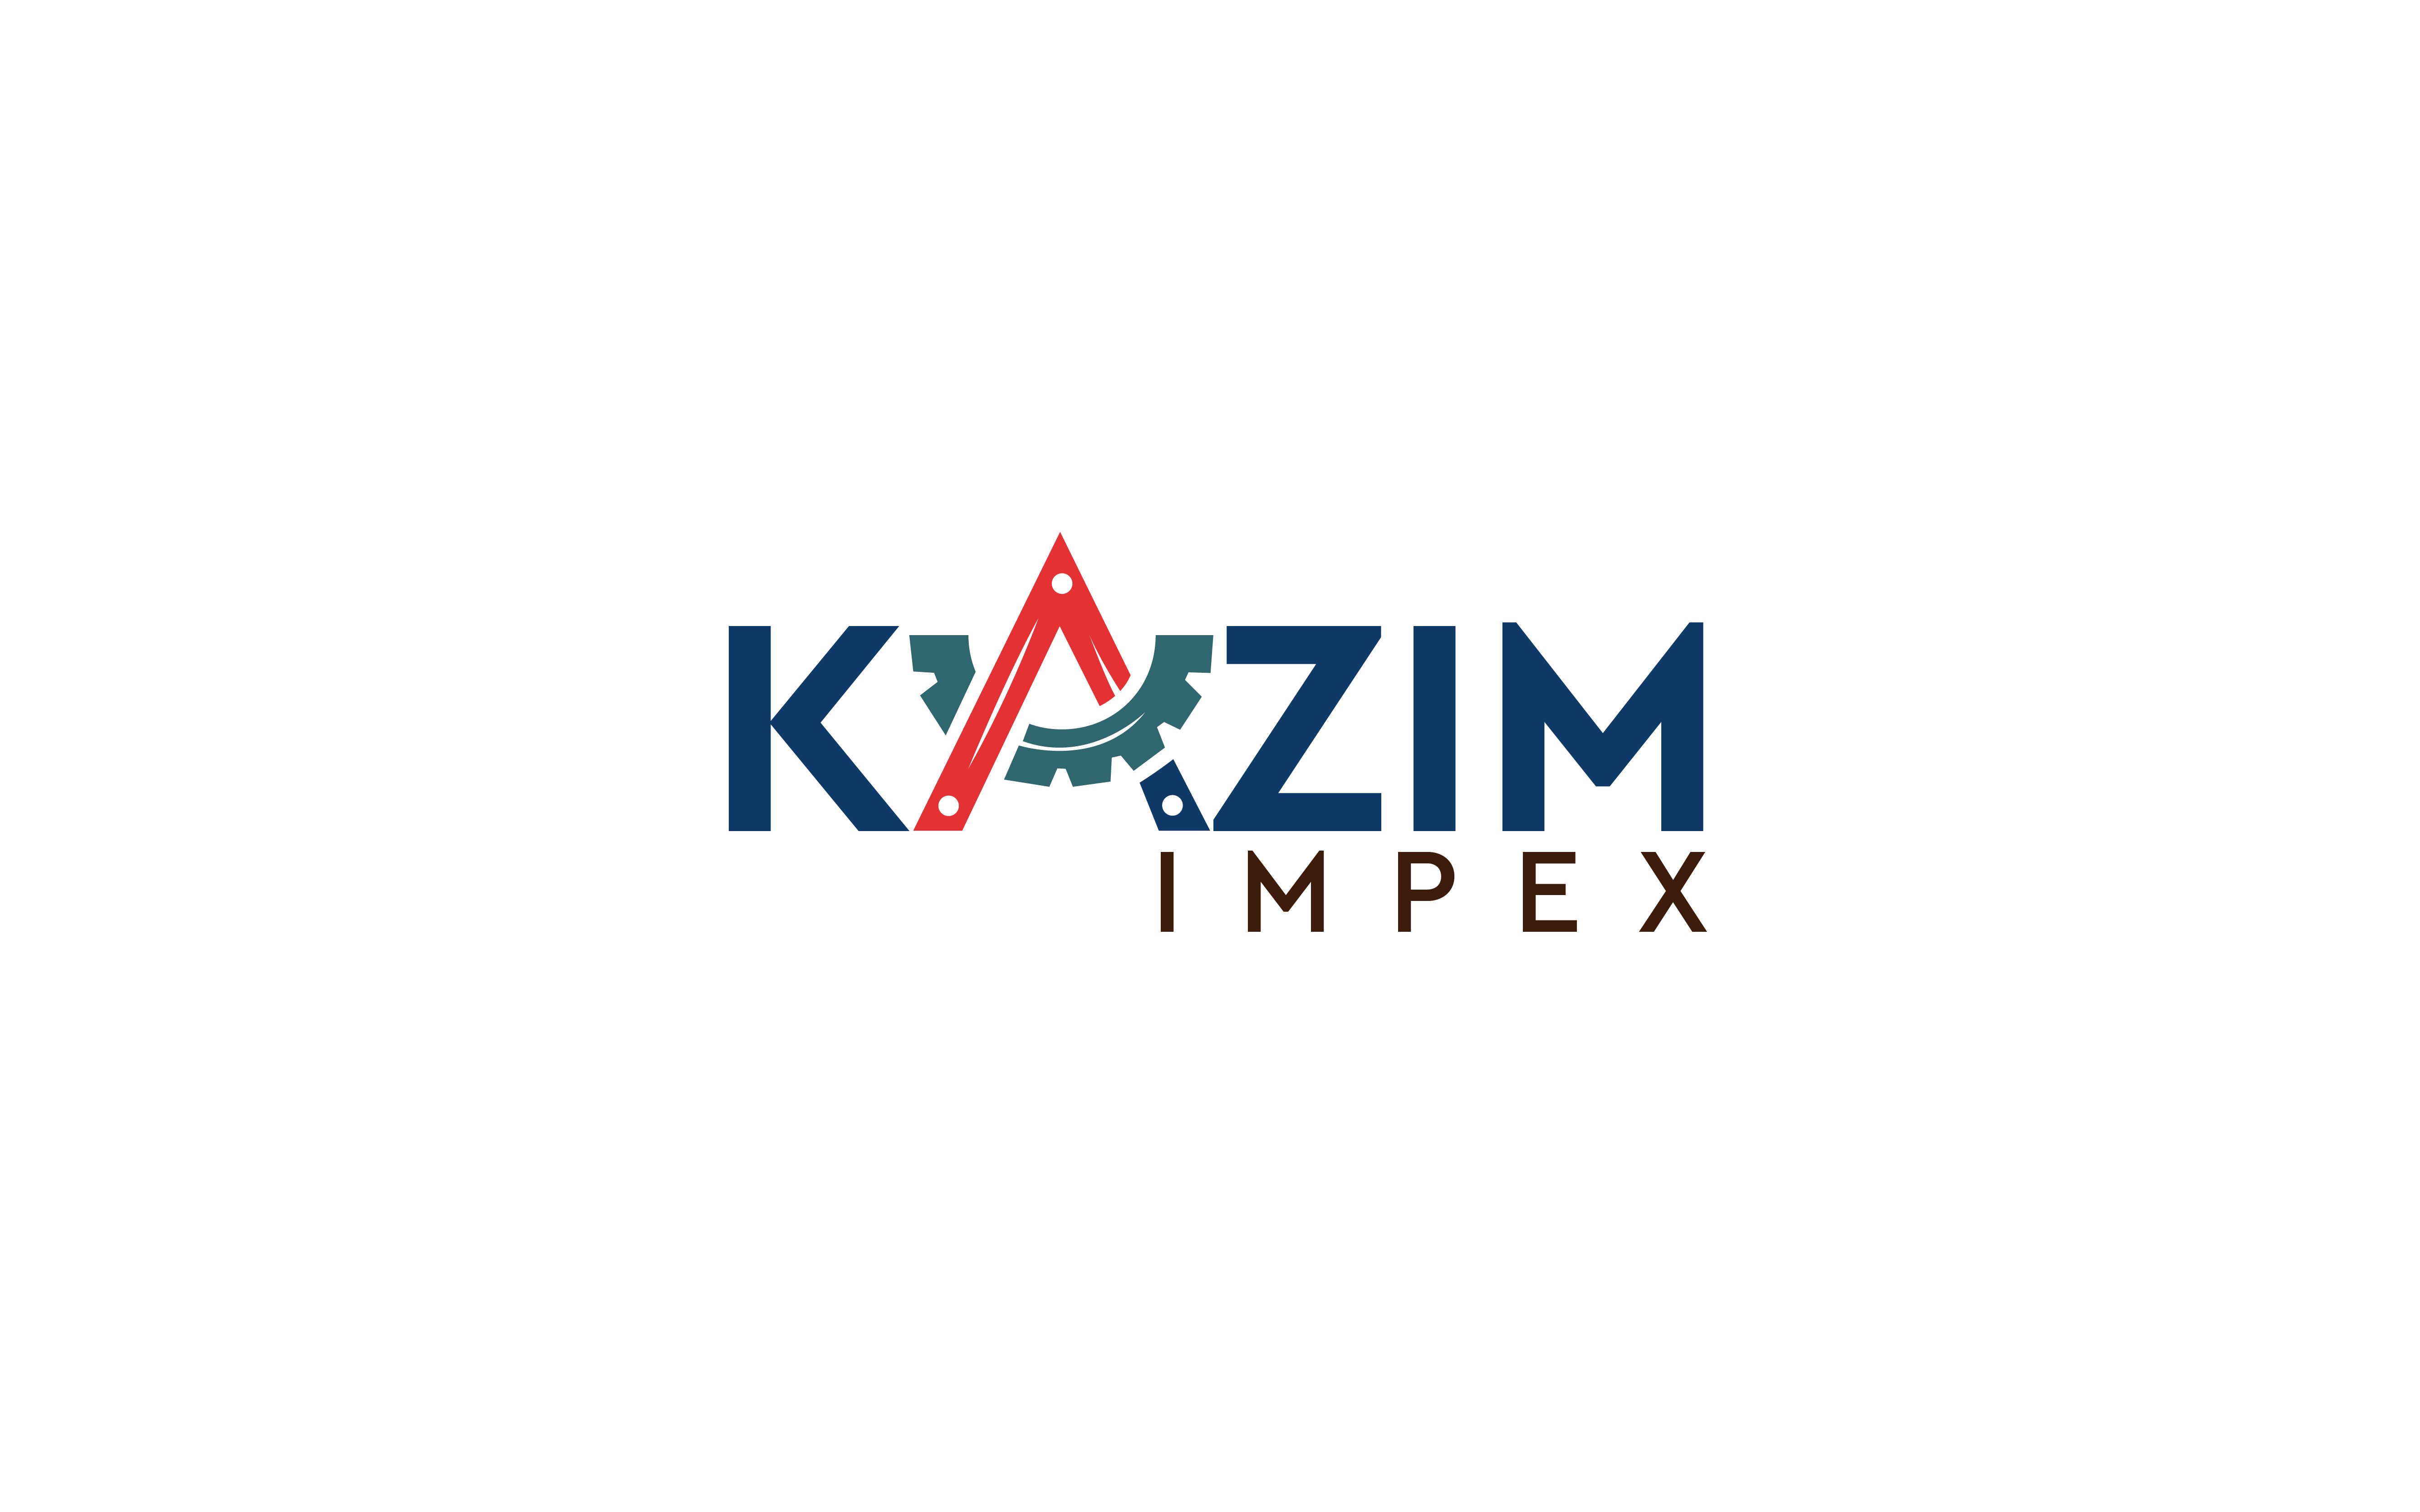 Kazim Impex Private Limited